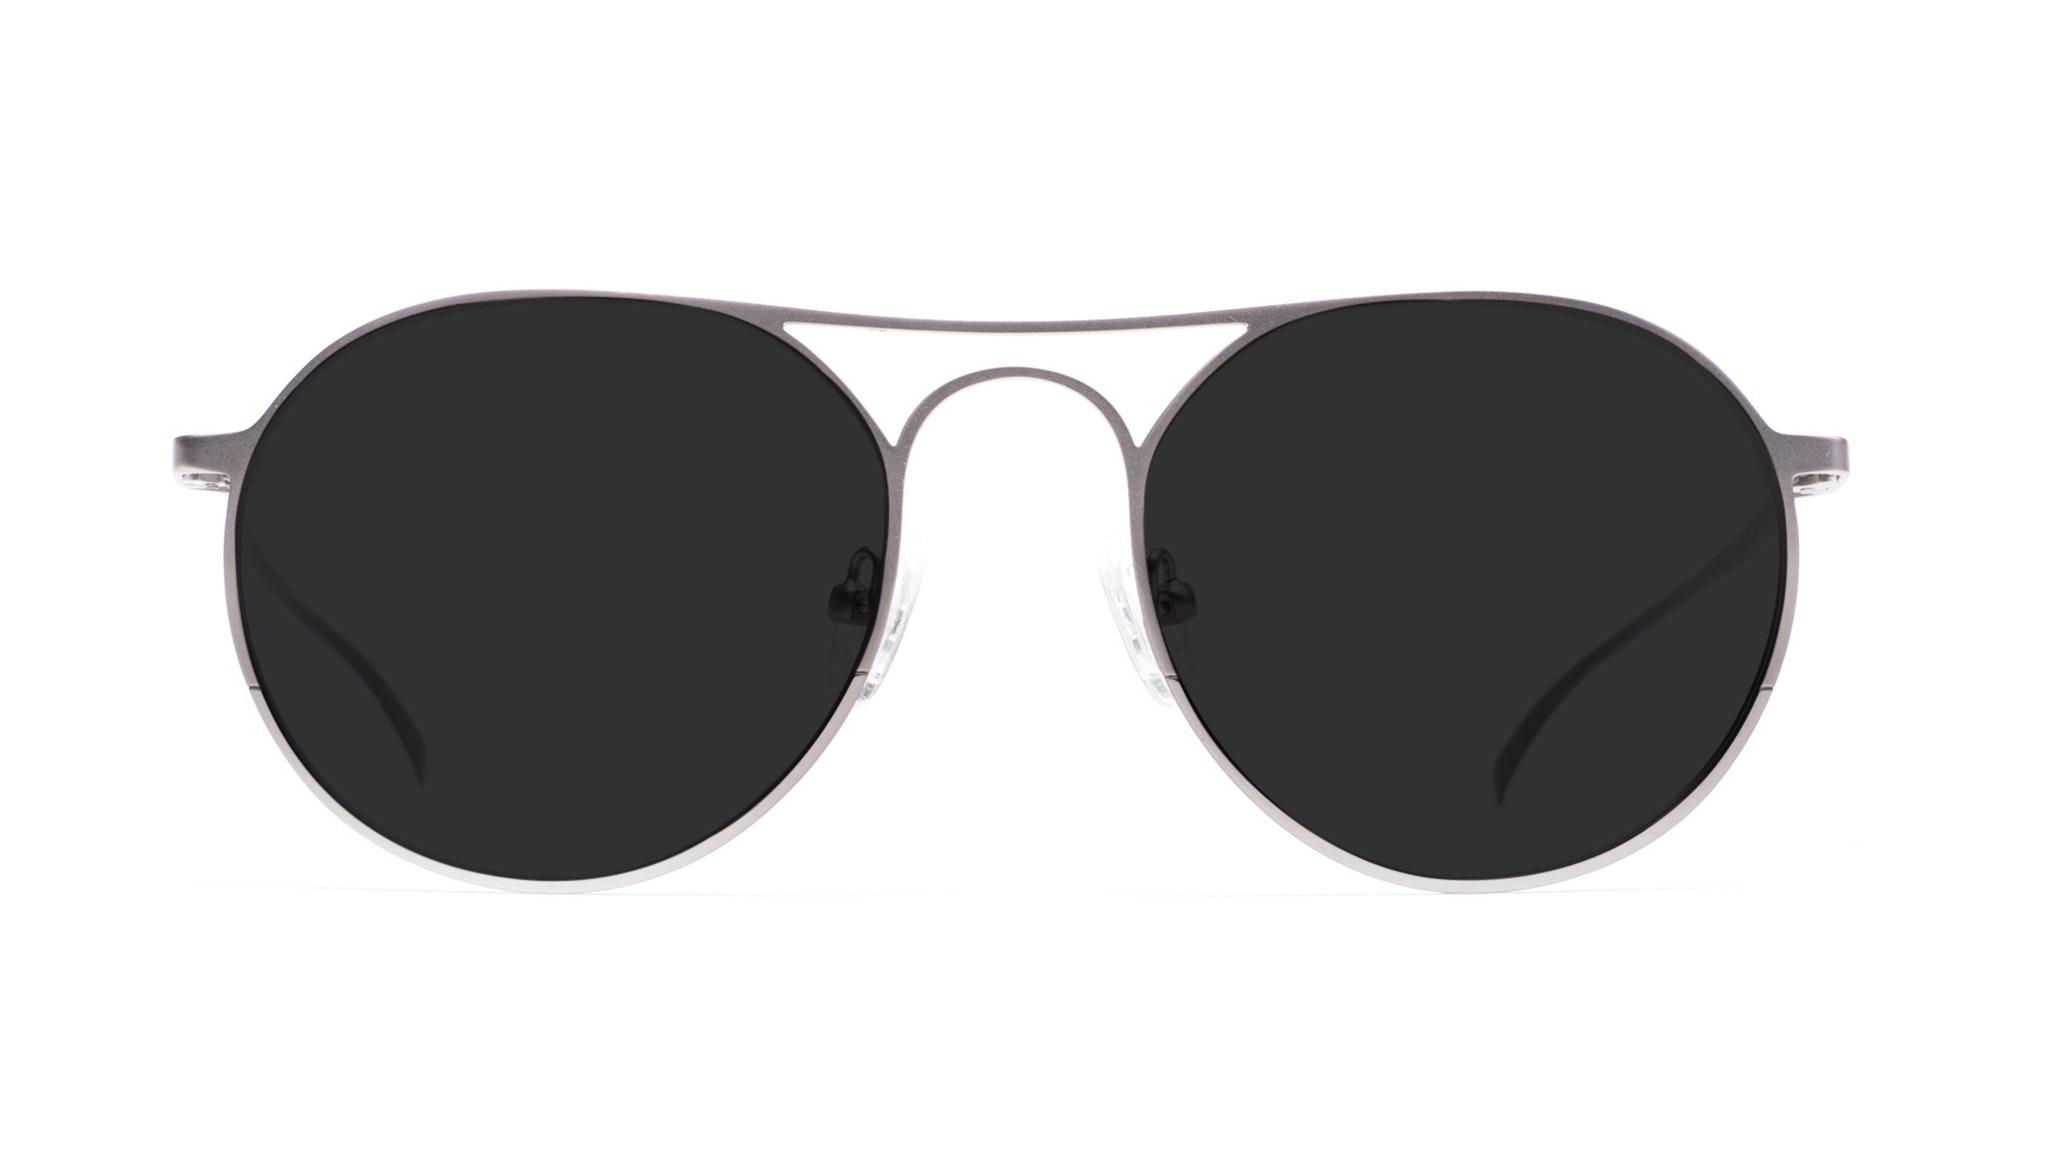 Affordable Fashion Glasses Aviator Round Sunglasses Men Contour Silver Front